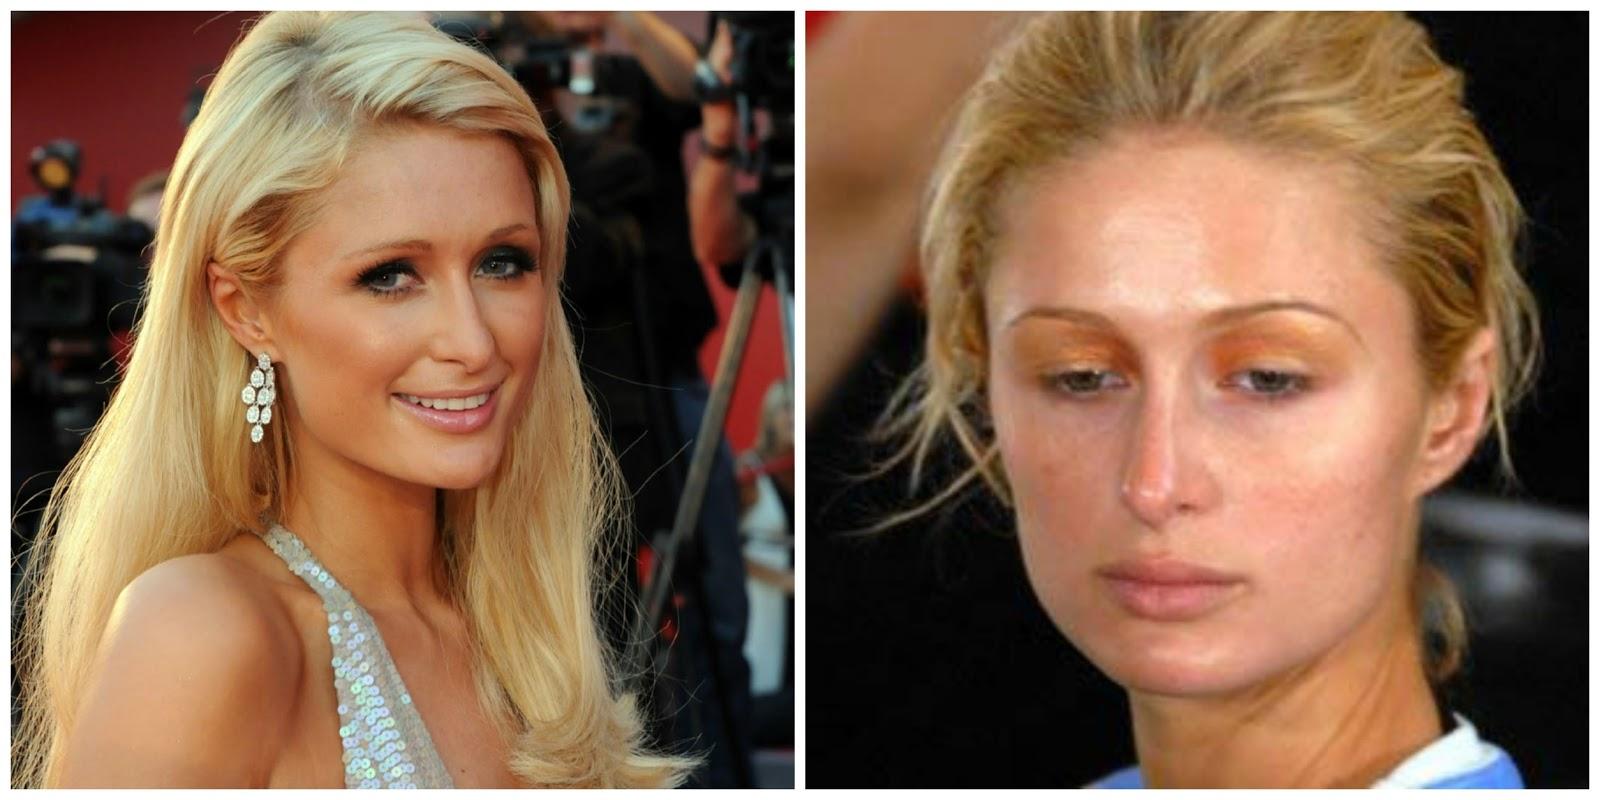 PiinkBeautyPrincess: Celebrities without make up #2